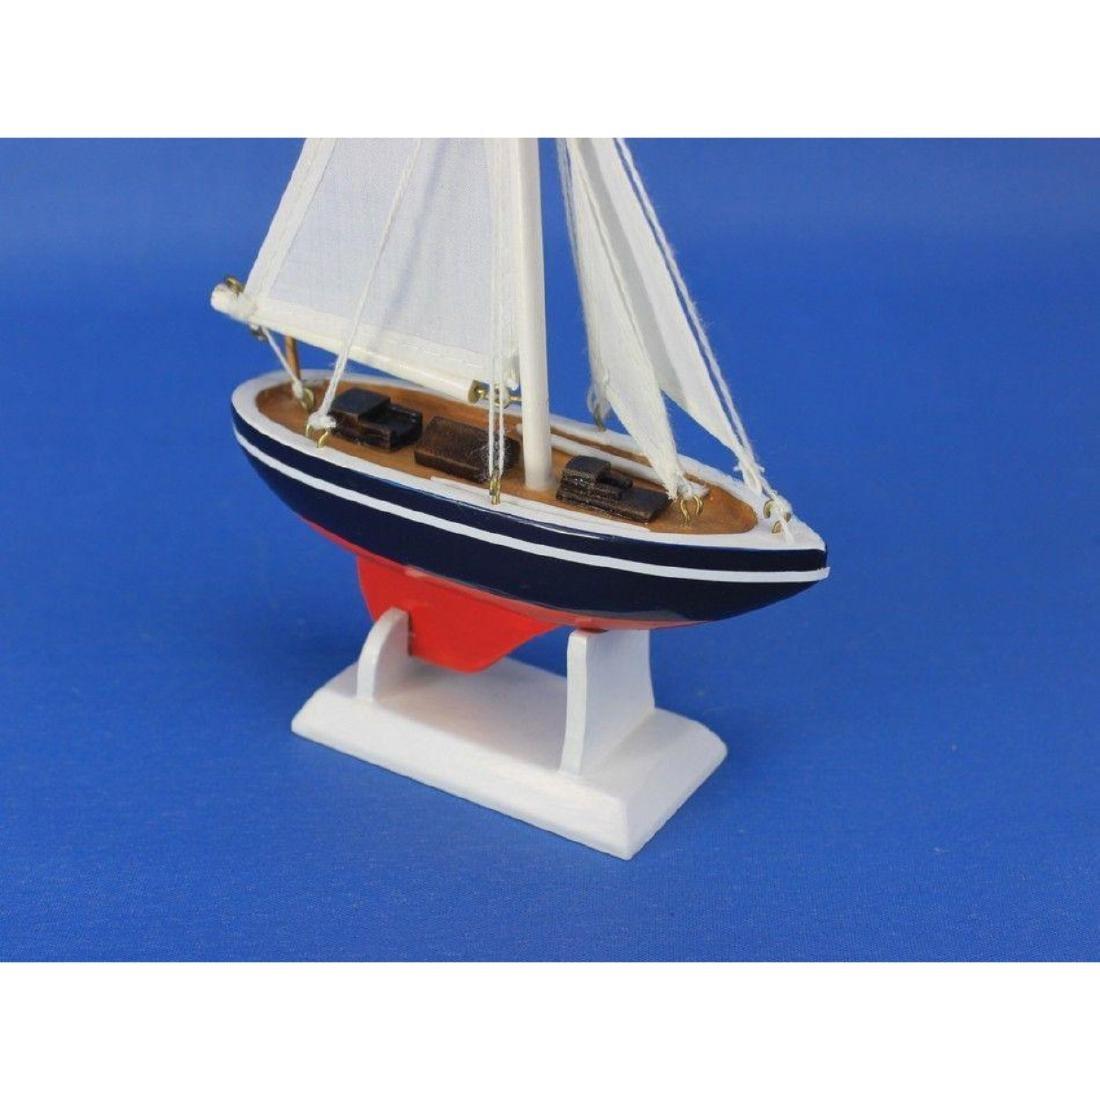 "Wooden American Sailer Model Sailboat Decoration 9"" - 4"